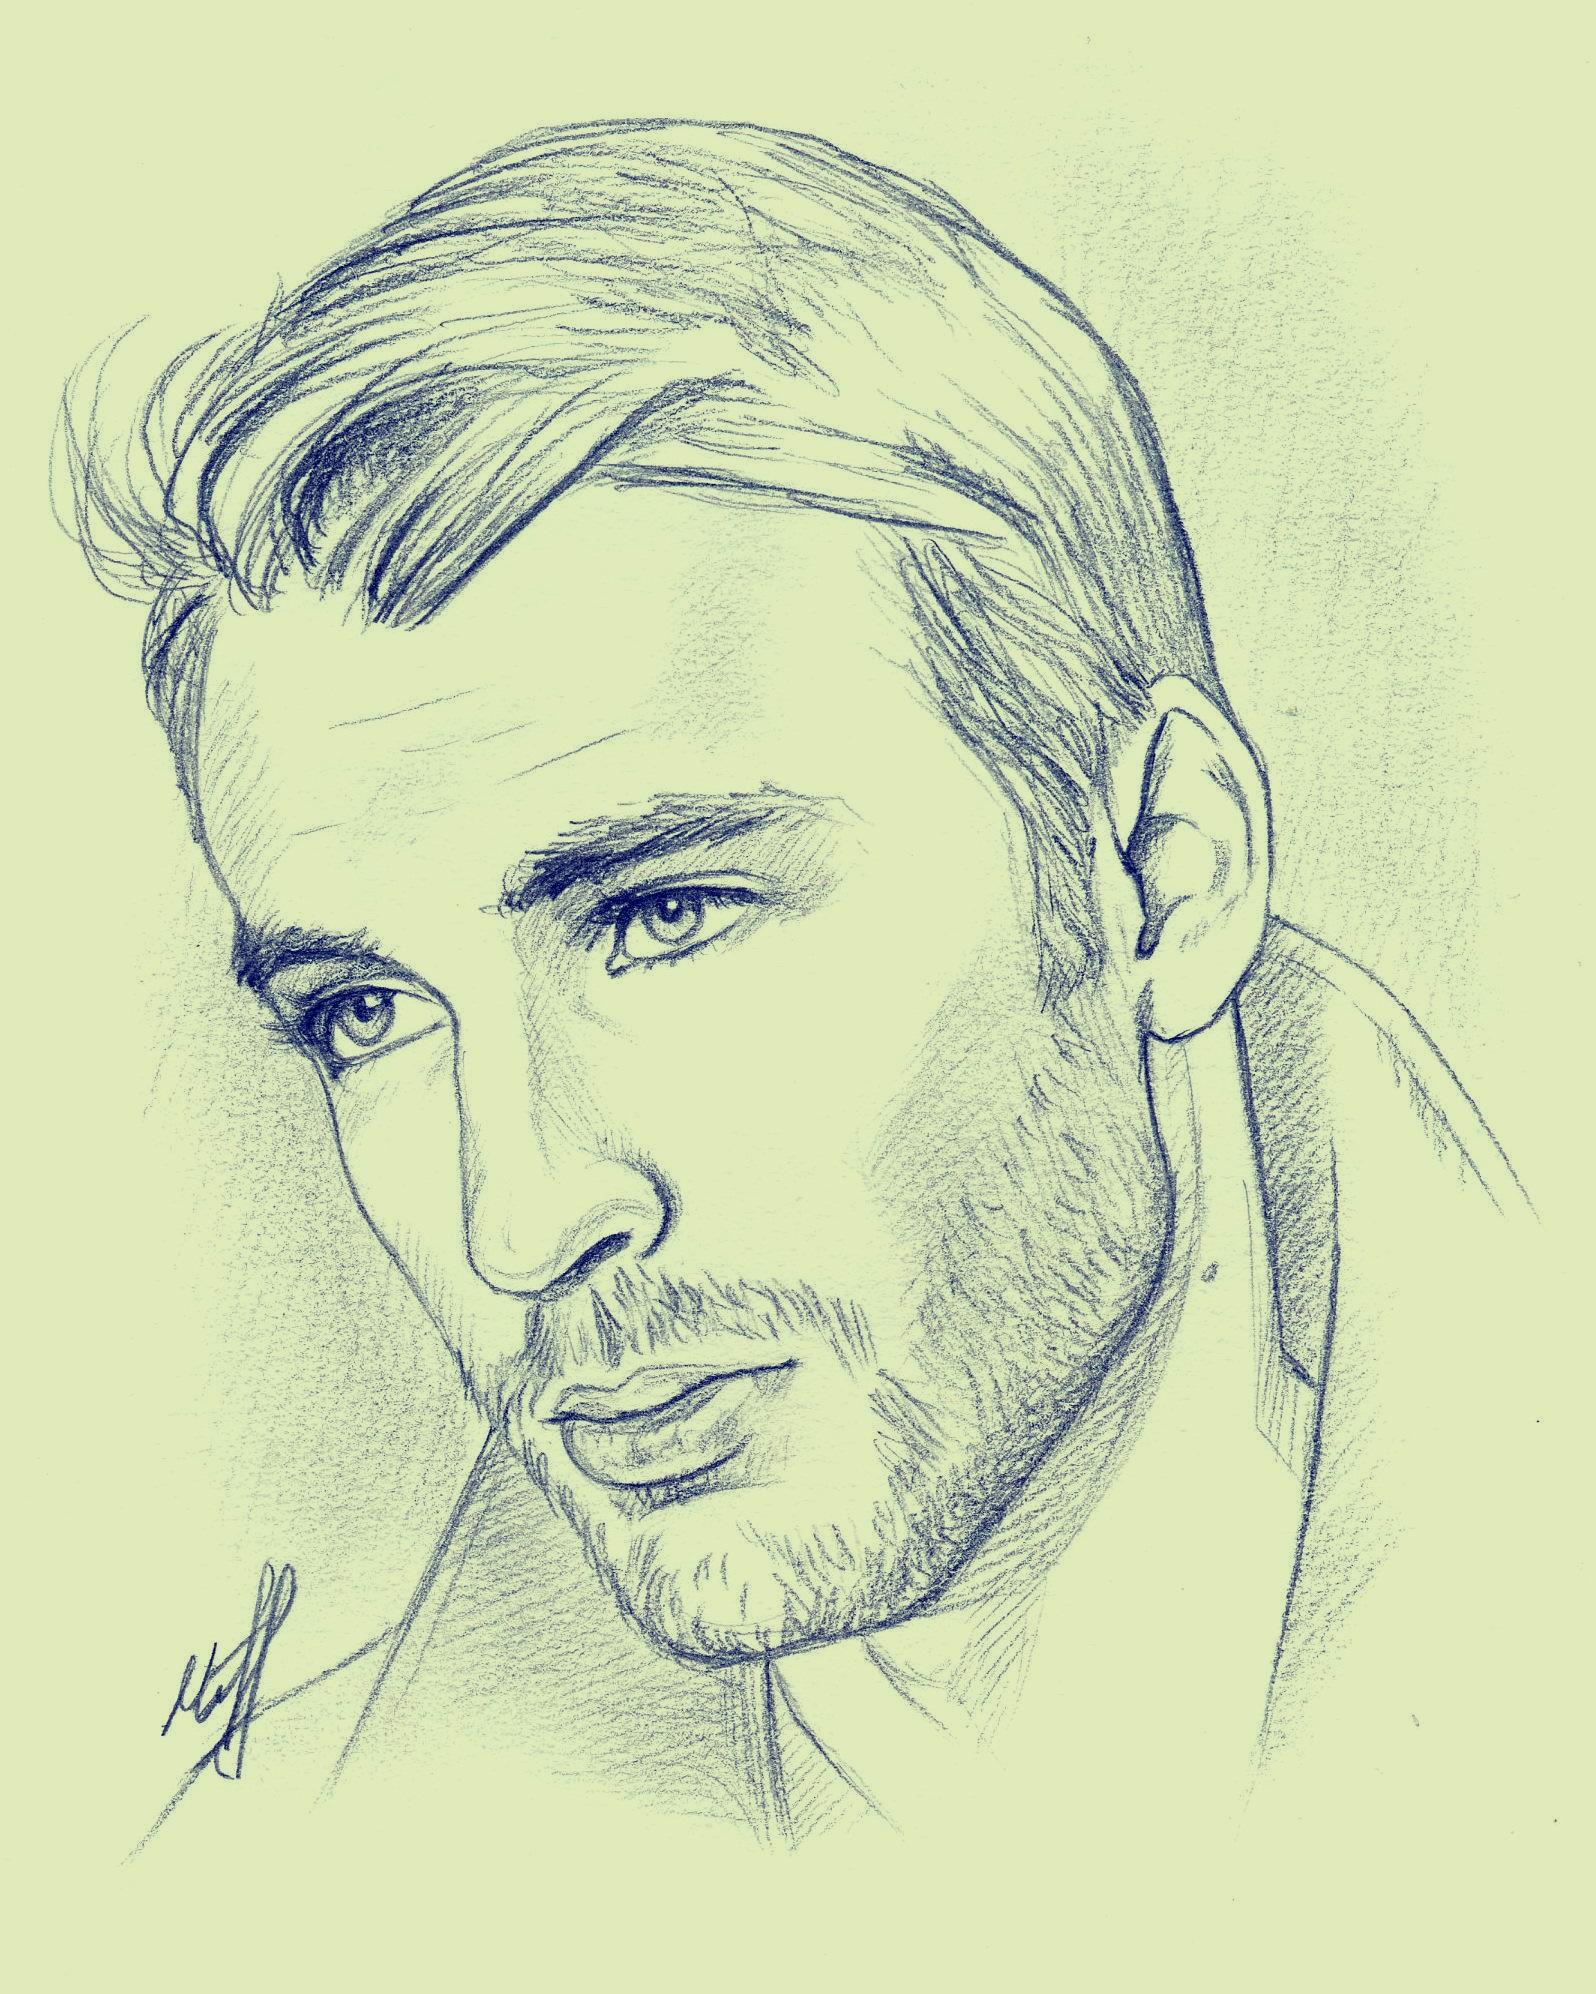 Chris Evans Sketch By KseniaParetsky On DeviantArt